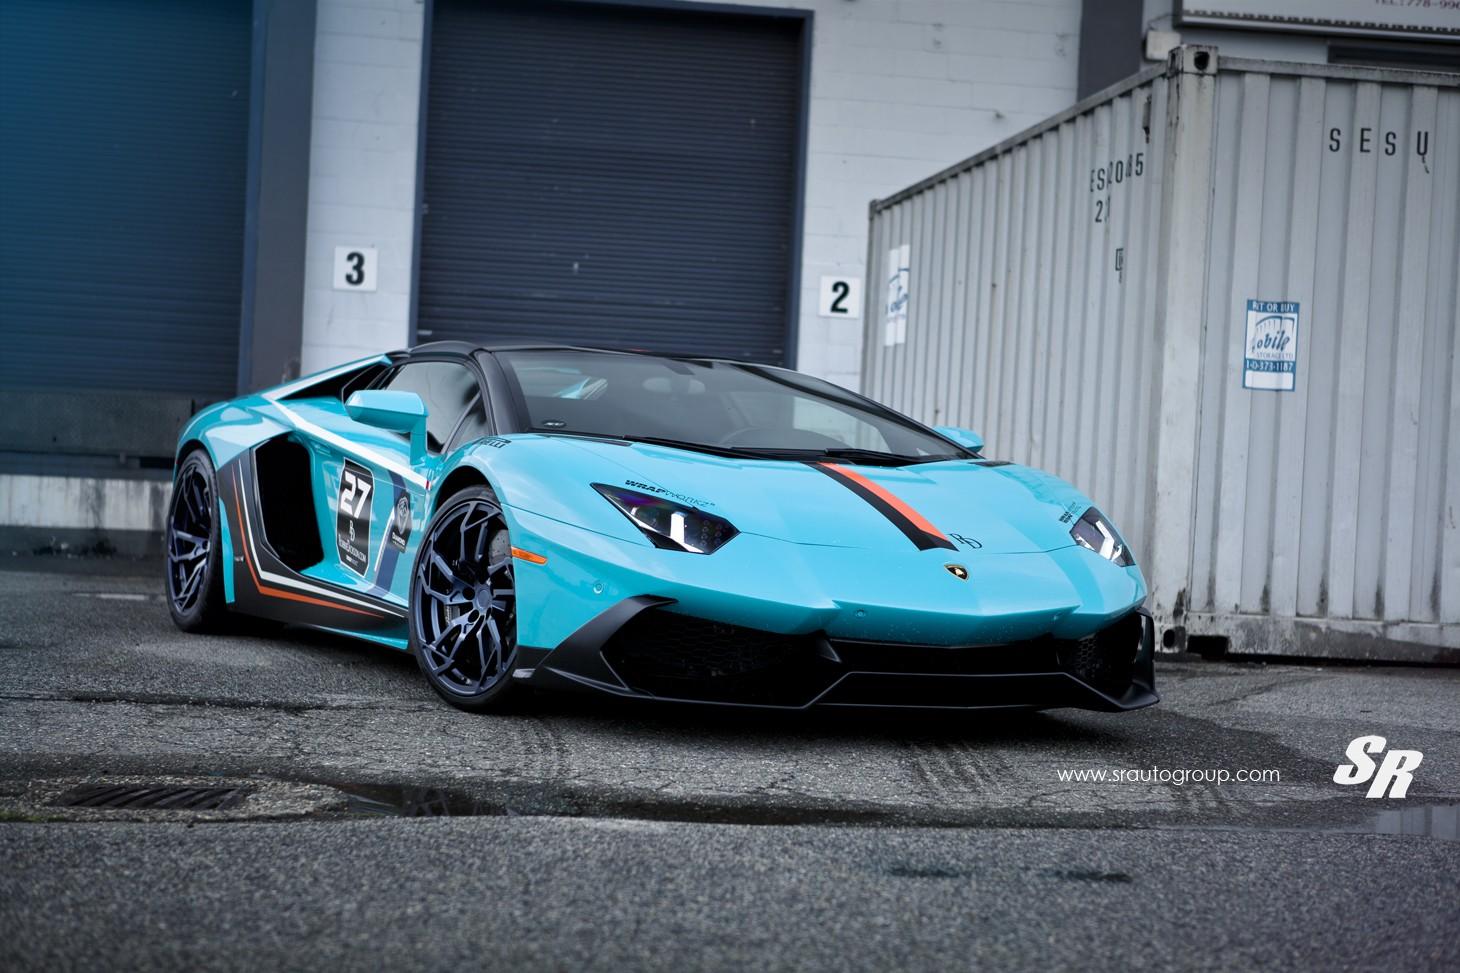 Exotic Hd Car Wallpapers Baby Blue Lamborghini Aventador Gets Pur Wheels Lp720